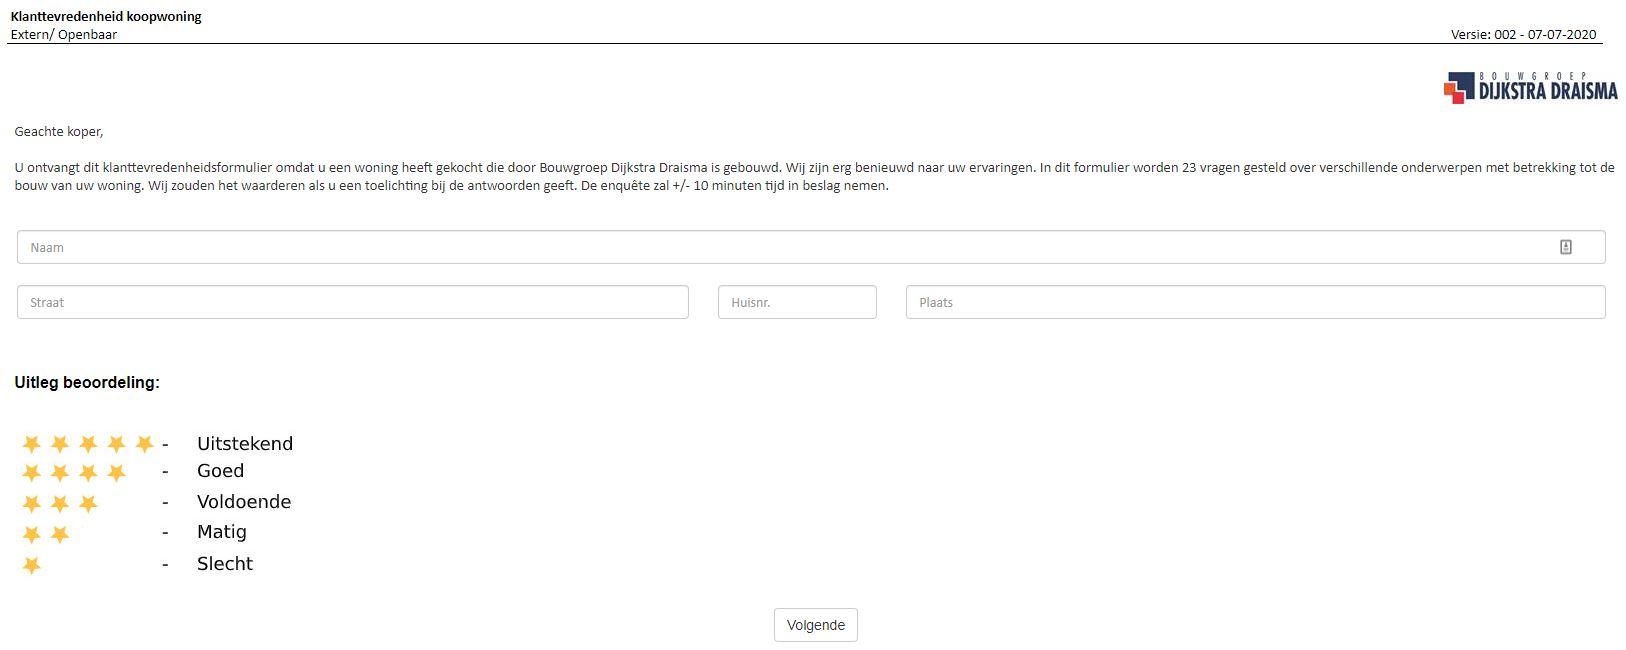 BGDD webformulier klanttevredenheid.